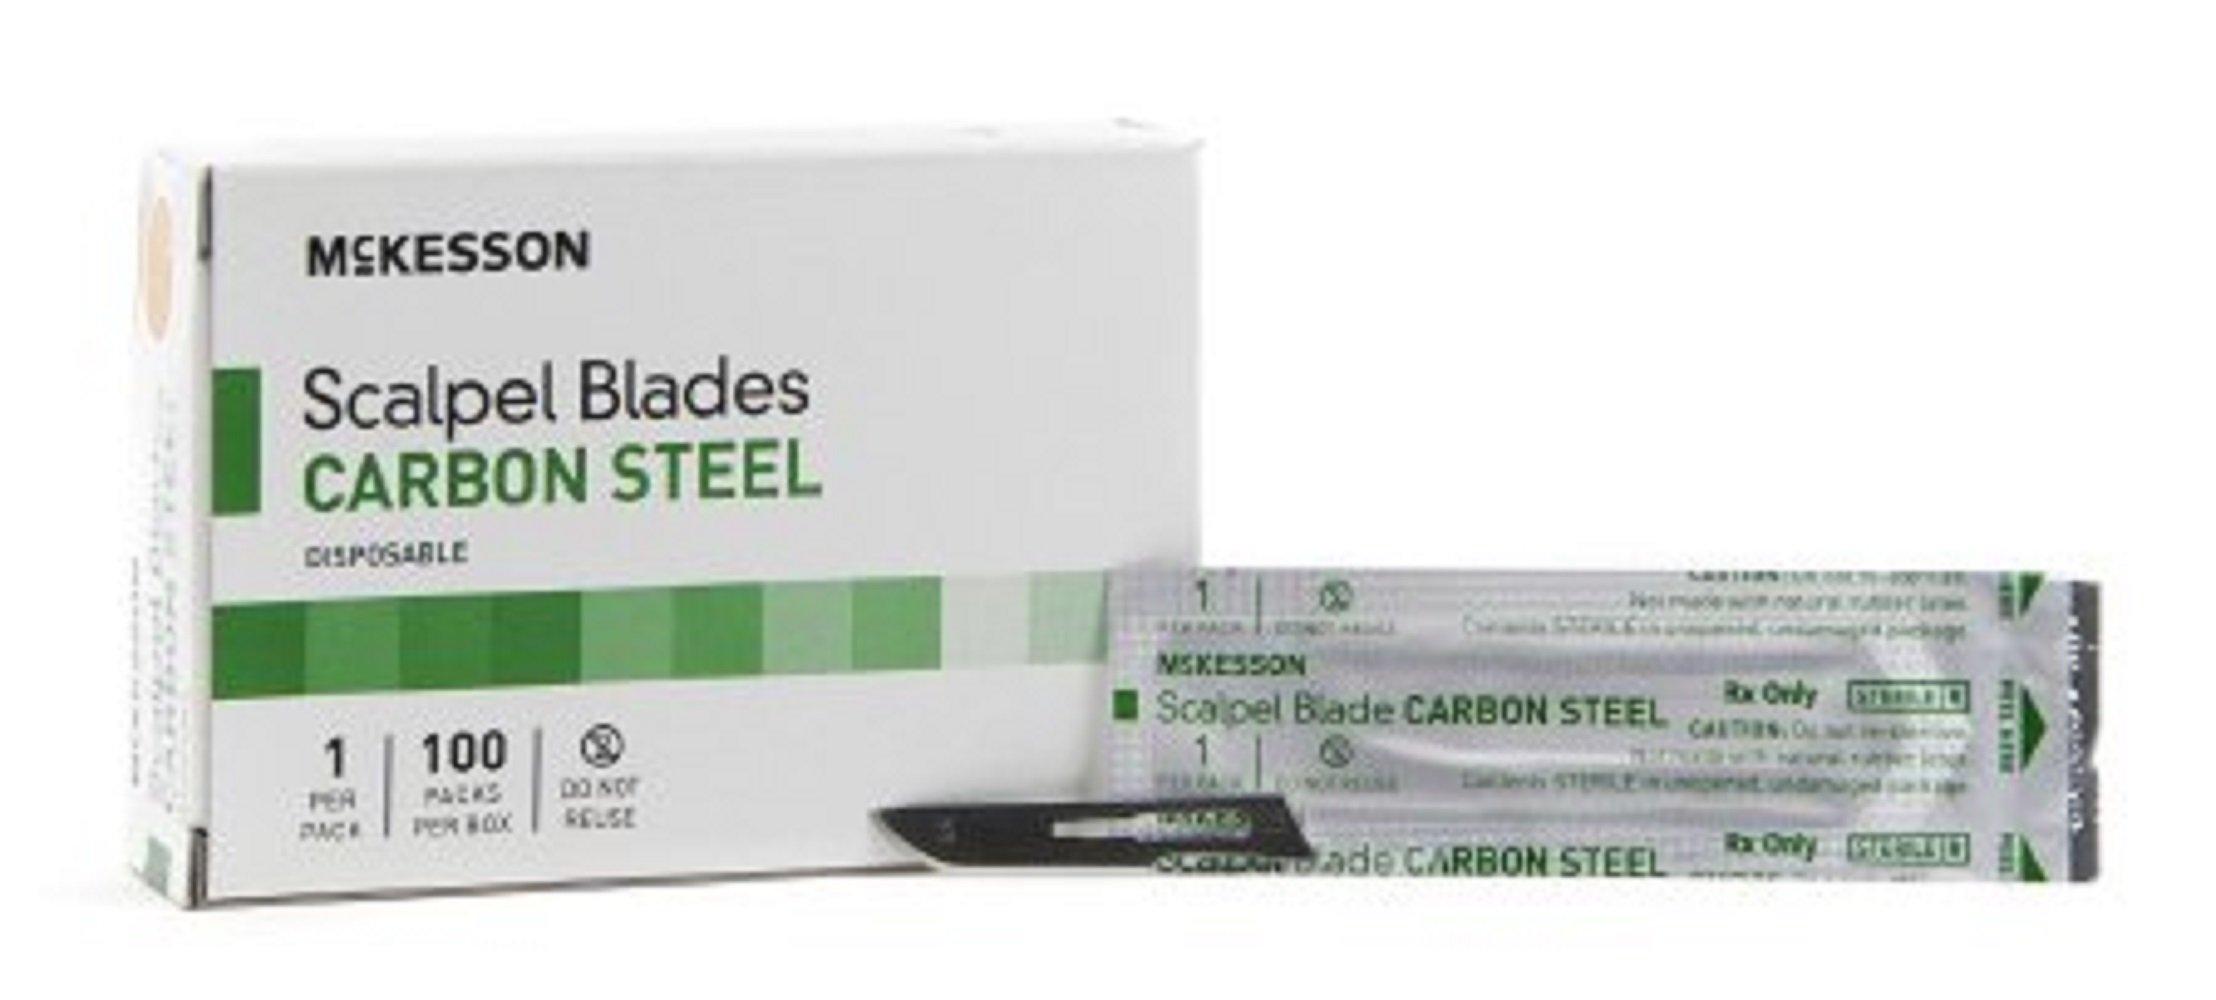 McKesson Brand - Surgical Blade - Carbon Steel - Size 10 - Sterile Disposable - Knife Edge - 5000pcs/Case